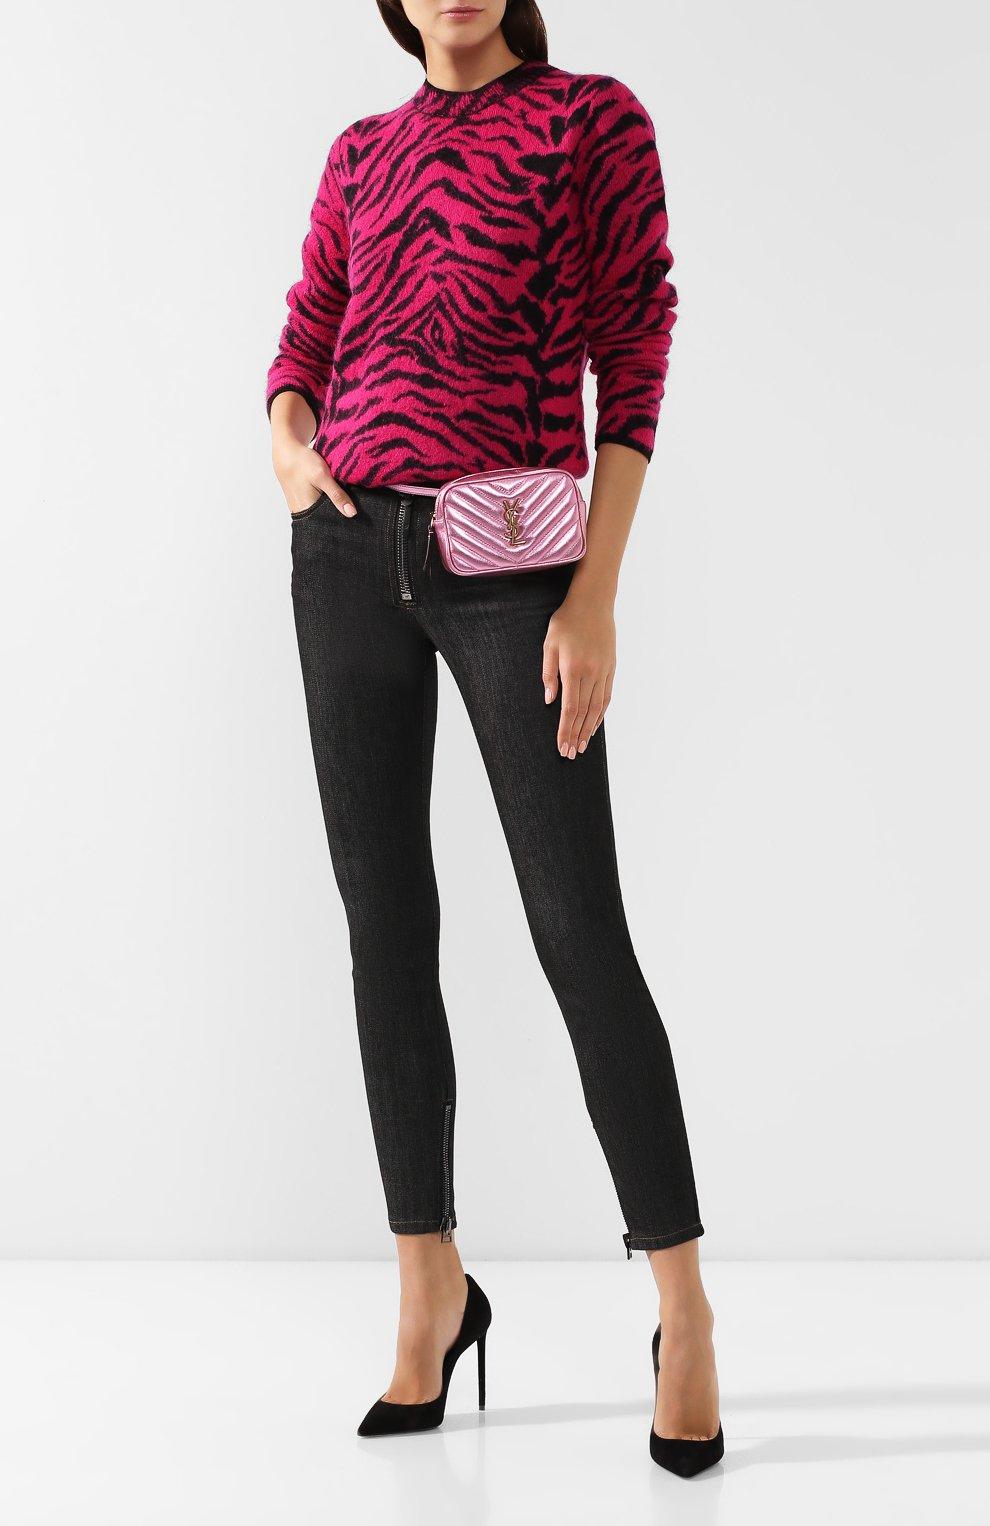 Женская поясная сумка lou SAINT LAURENT розового цвета, арт. 534817/09E0W   Фото 2